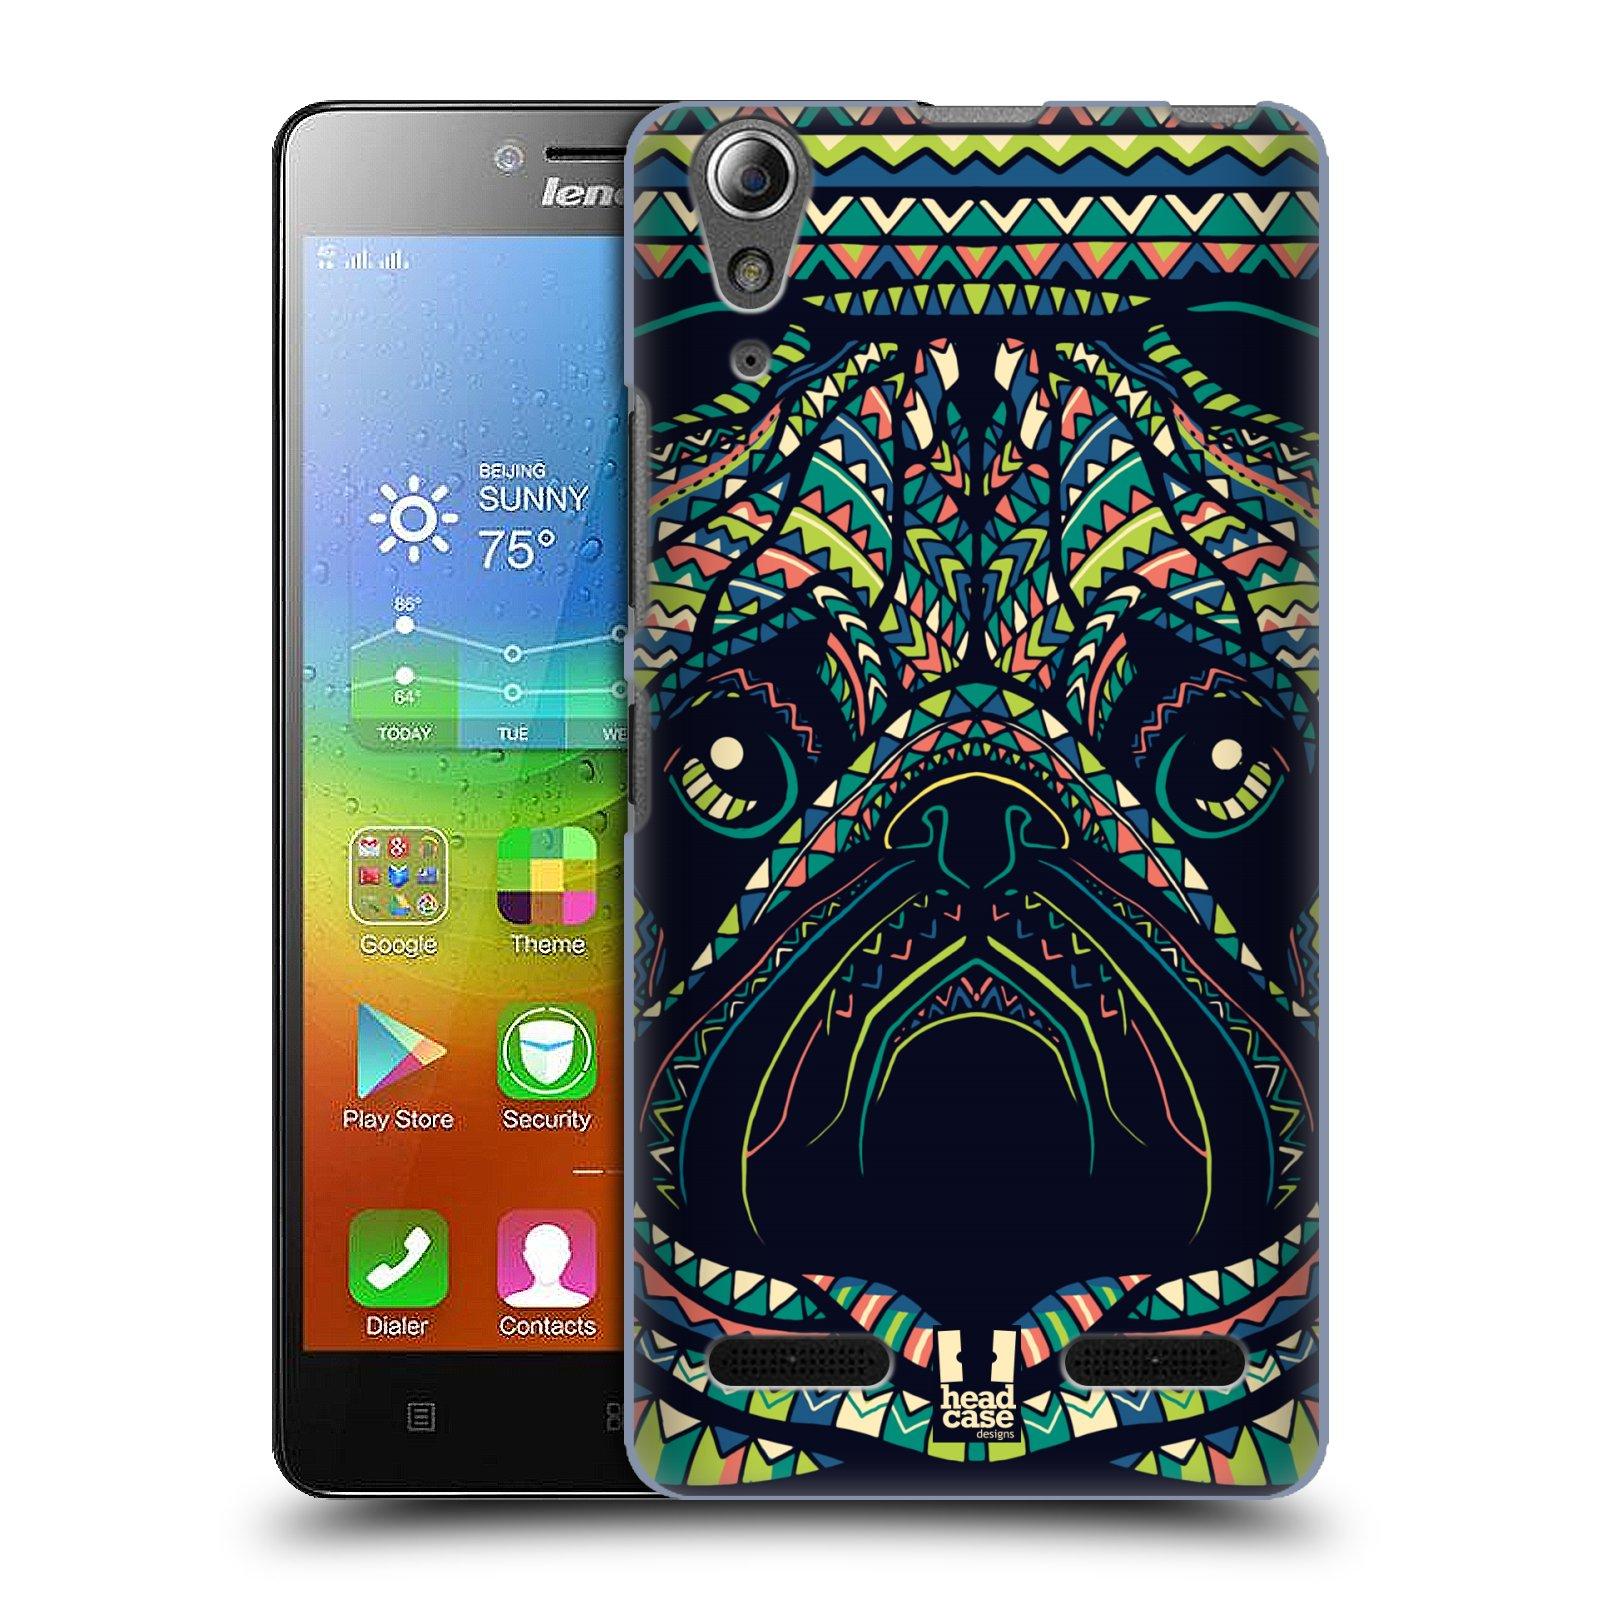 HEAD CASE pevný plastový obal na mobil LENOVO A6000 / A6000 PLUS vzor Aztécký motiv zvíře 3 mopsík